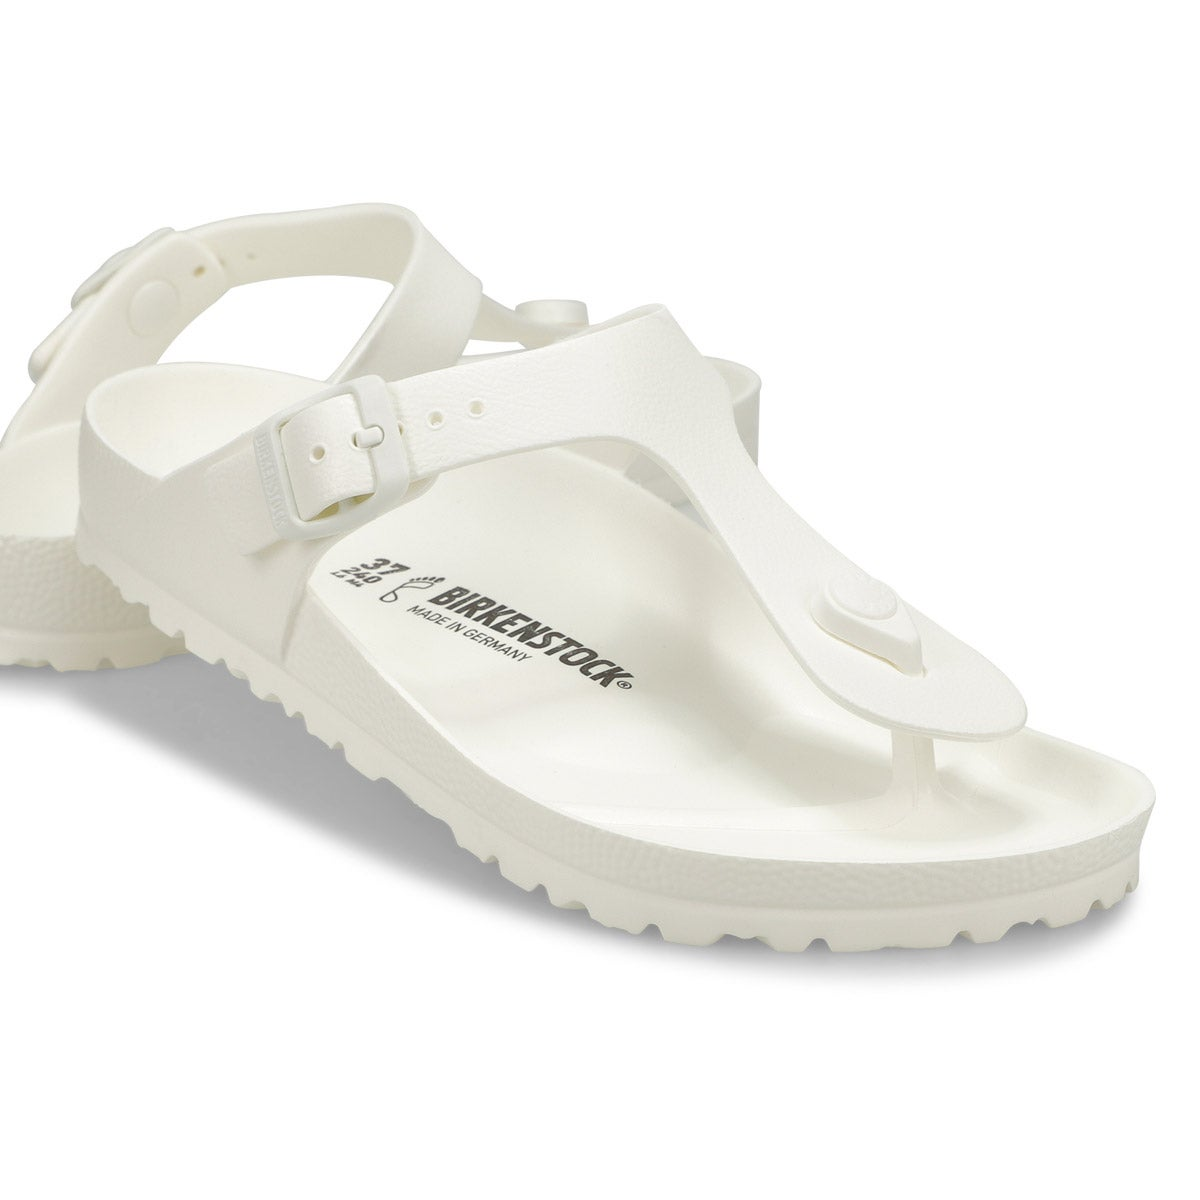 Sandales tongs Gizeh, blanc, fem